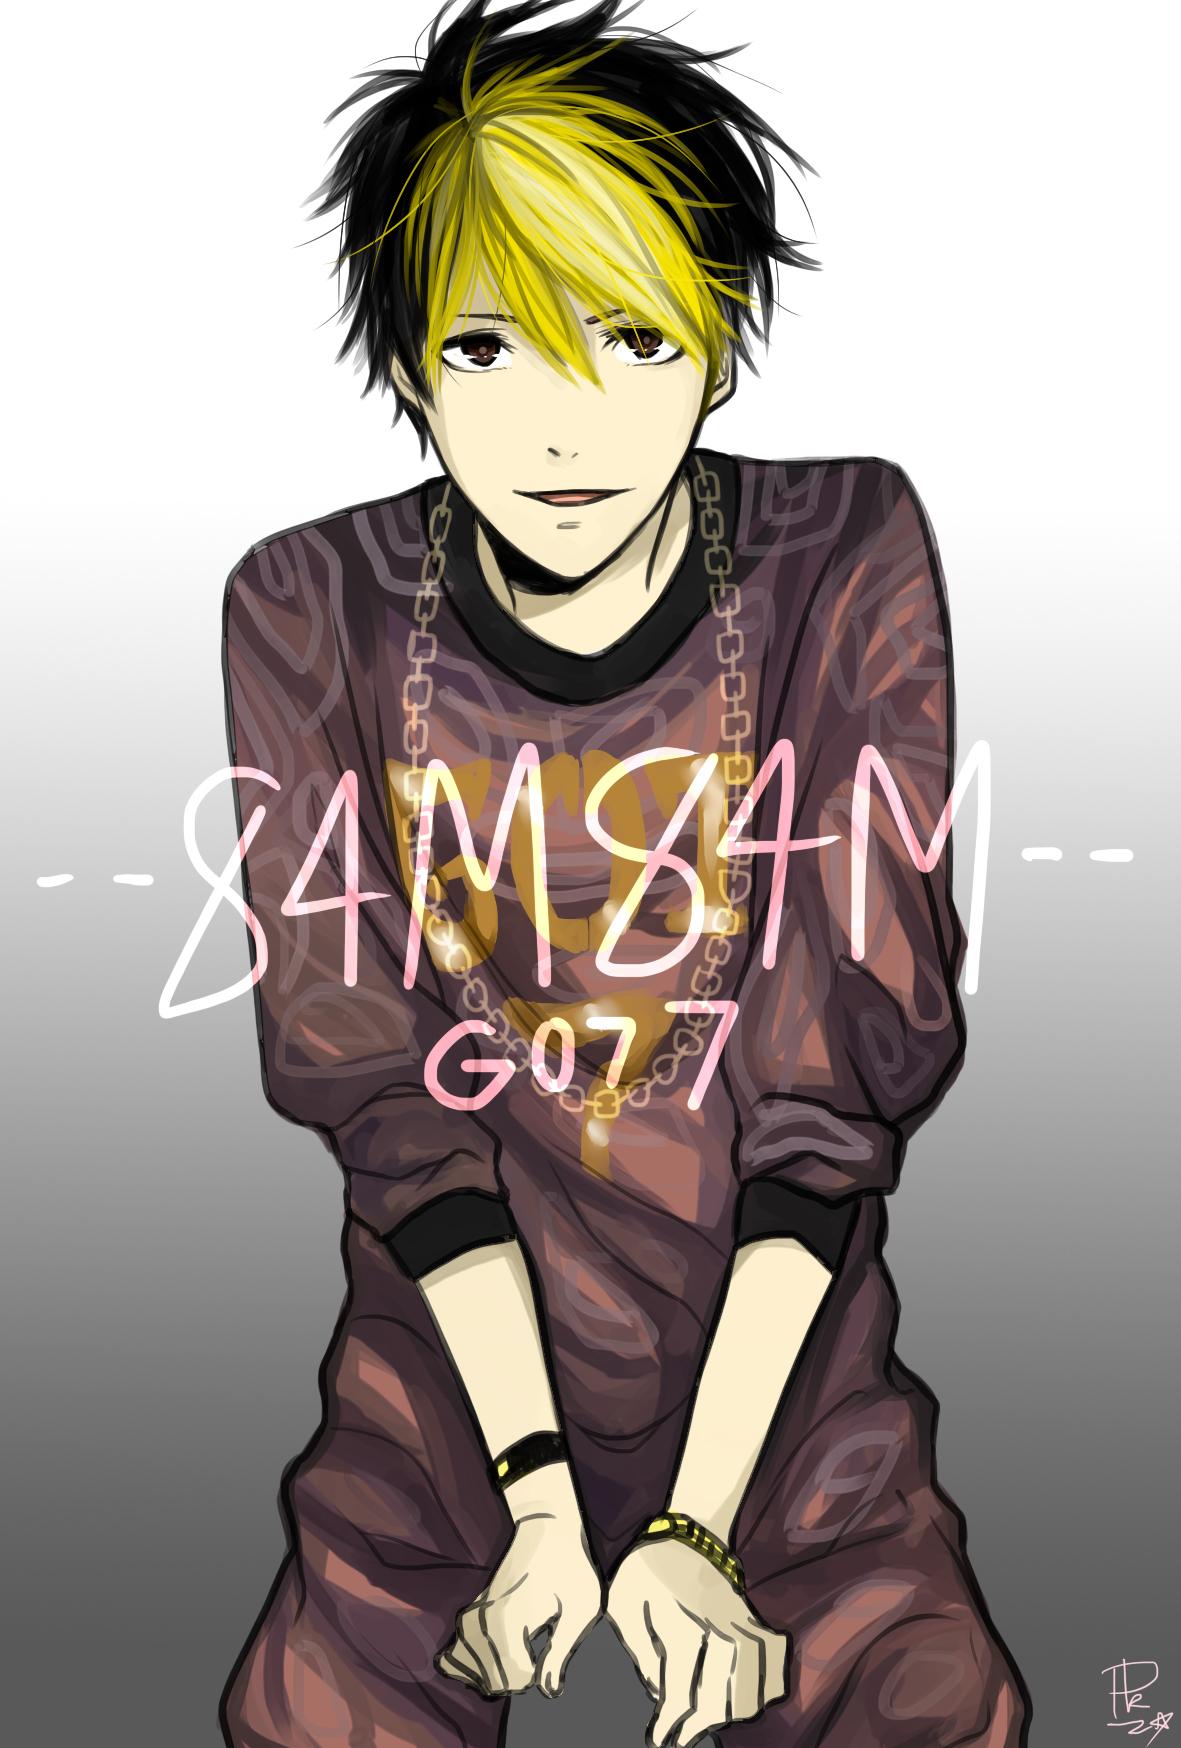 bam chiki bam bam song download